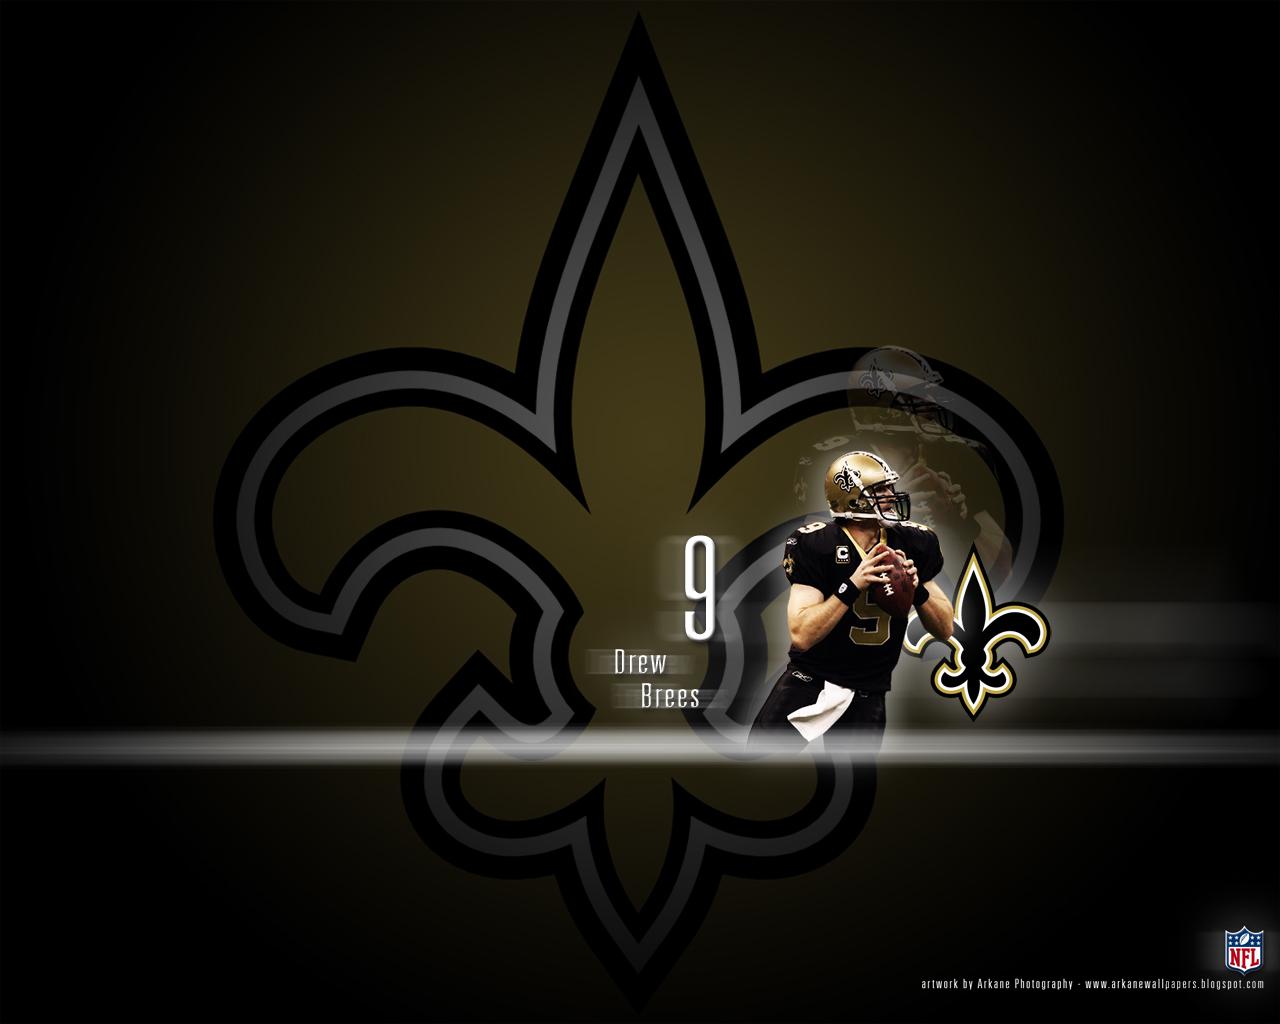 New Orleans Saints wallpaper wallpaper New Orleans Saints wallpapers 1280x1024